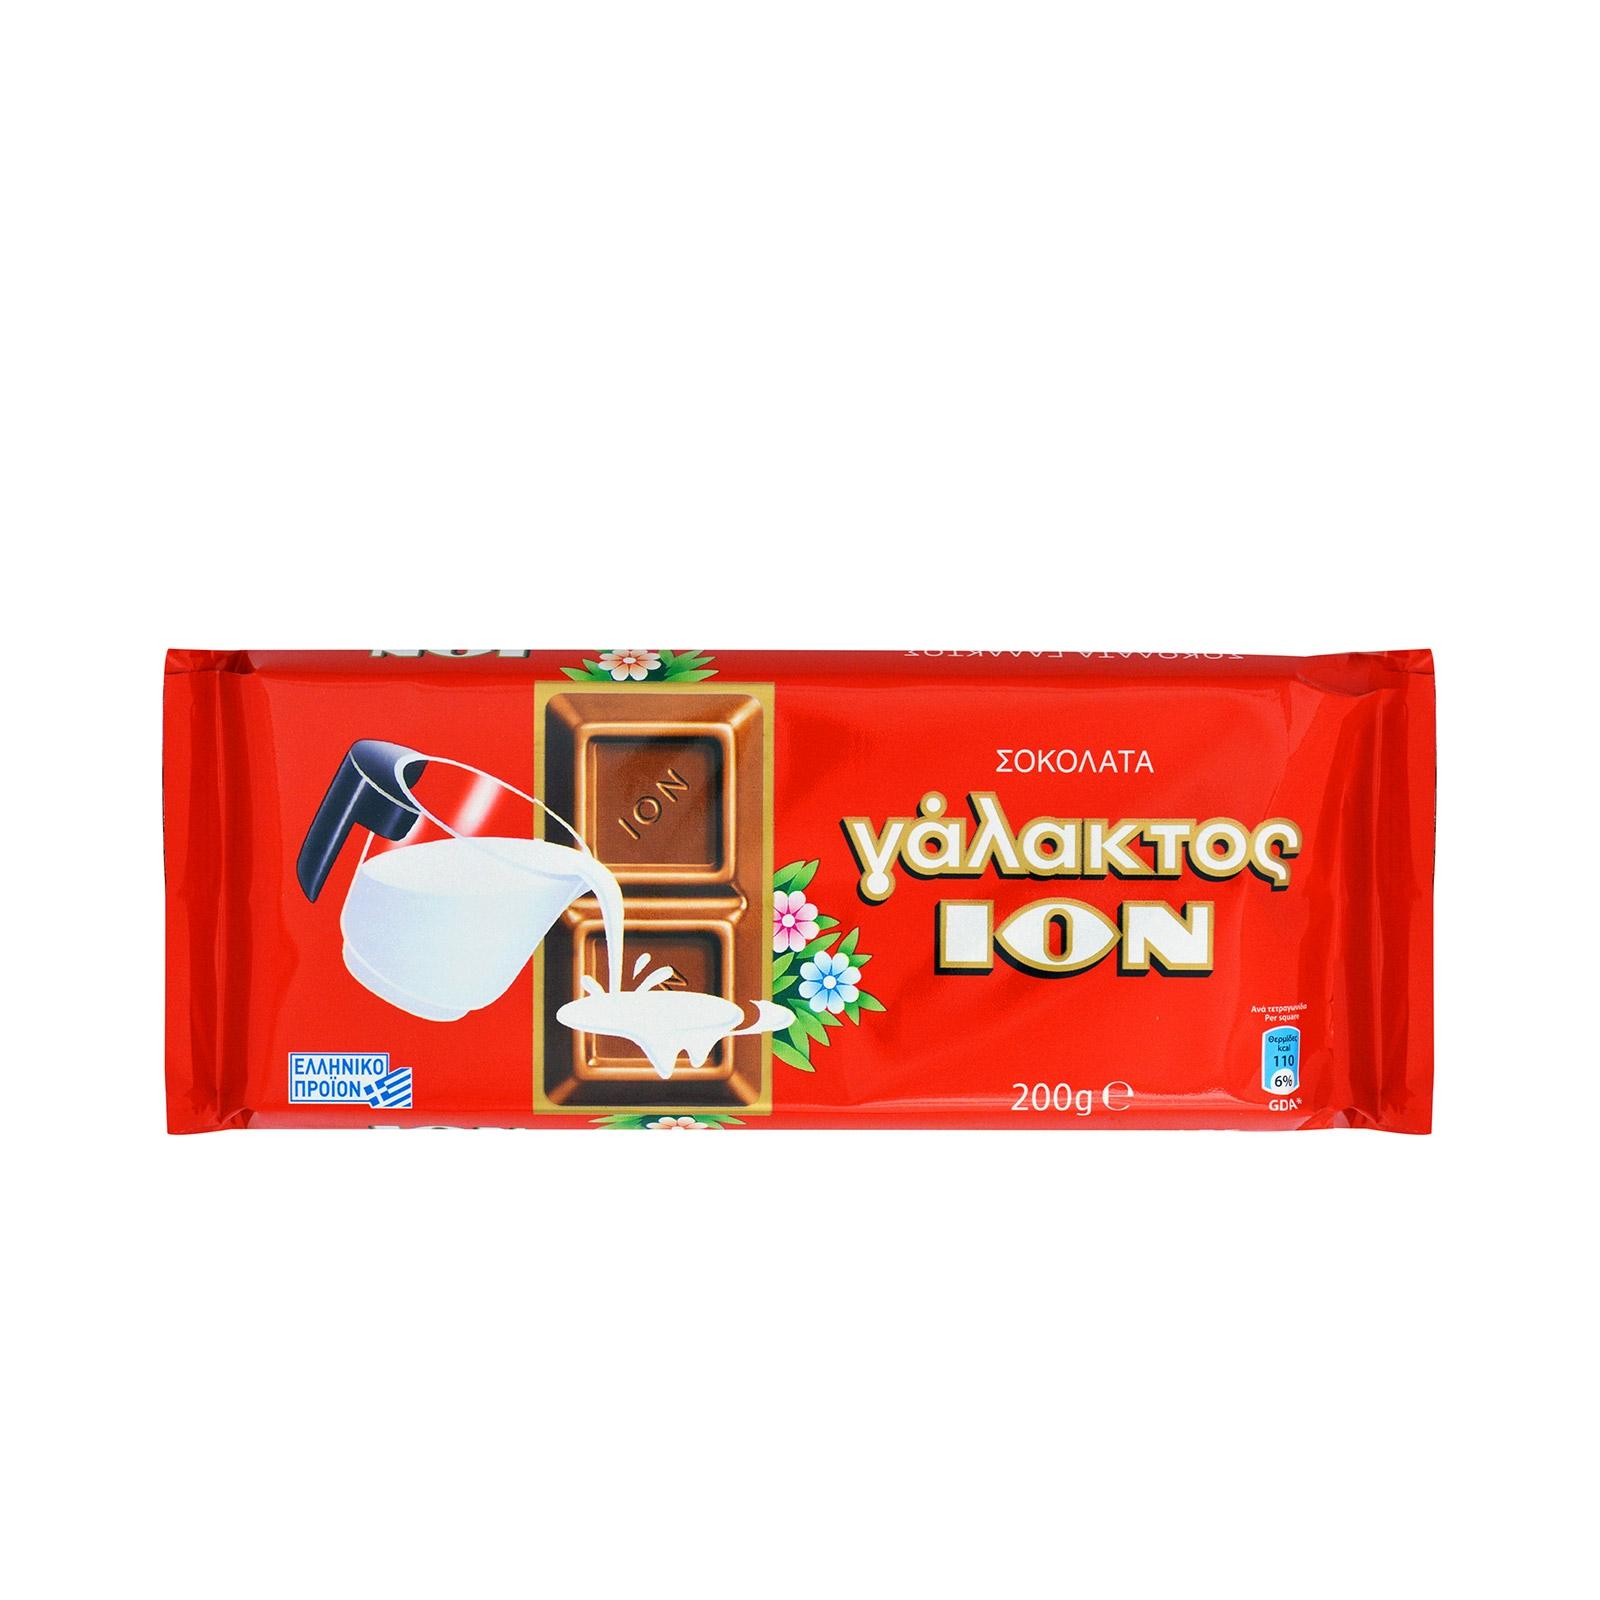 ION σοκολάτα logo